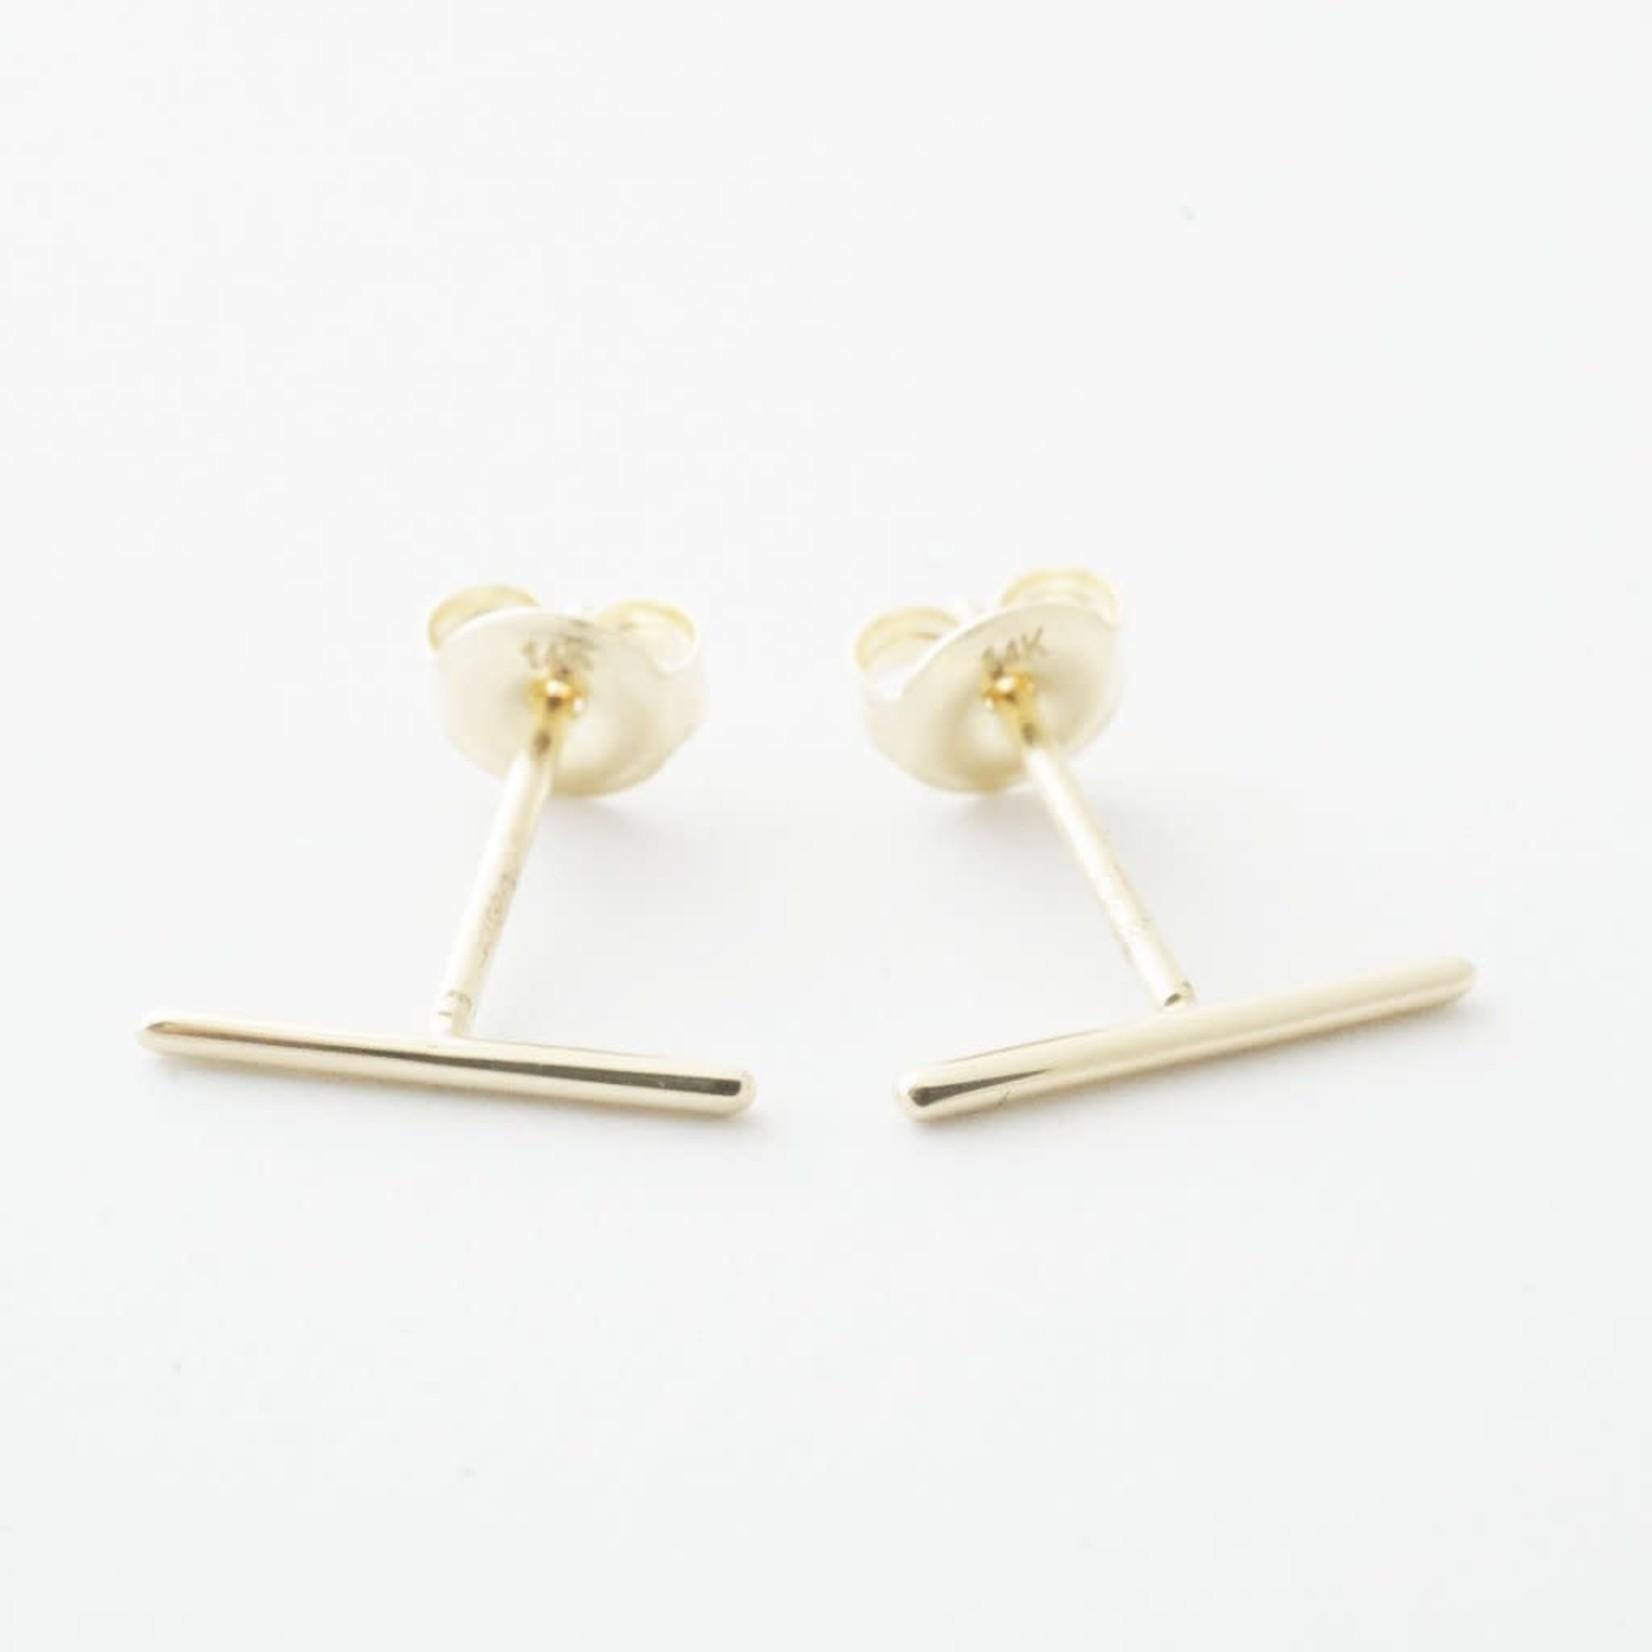 Honeycat Jewelry Honeycat Skinny Midi Bar Earring 14K Gold